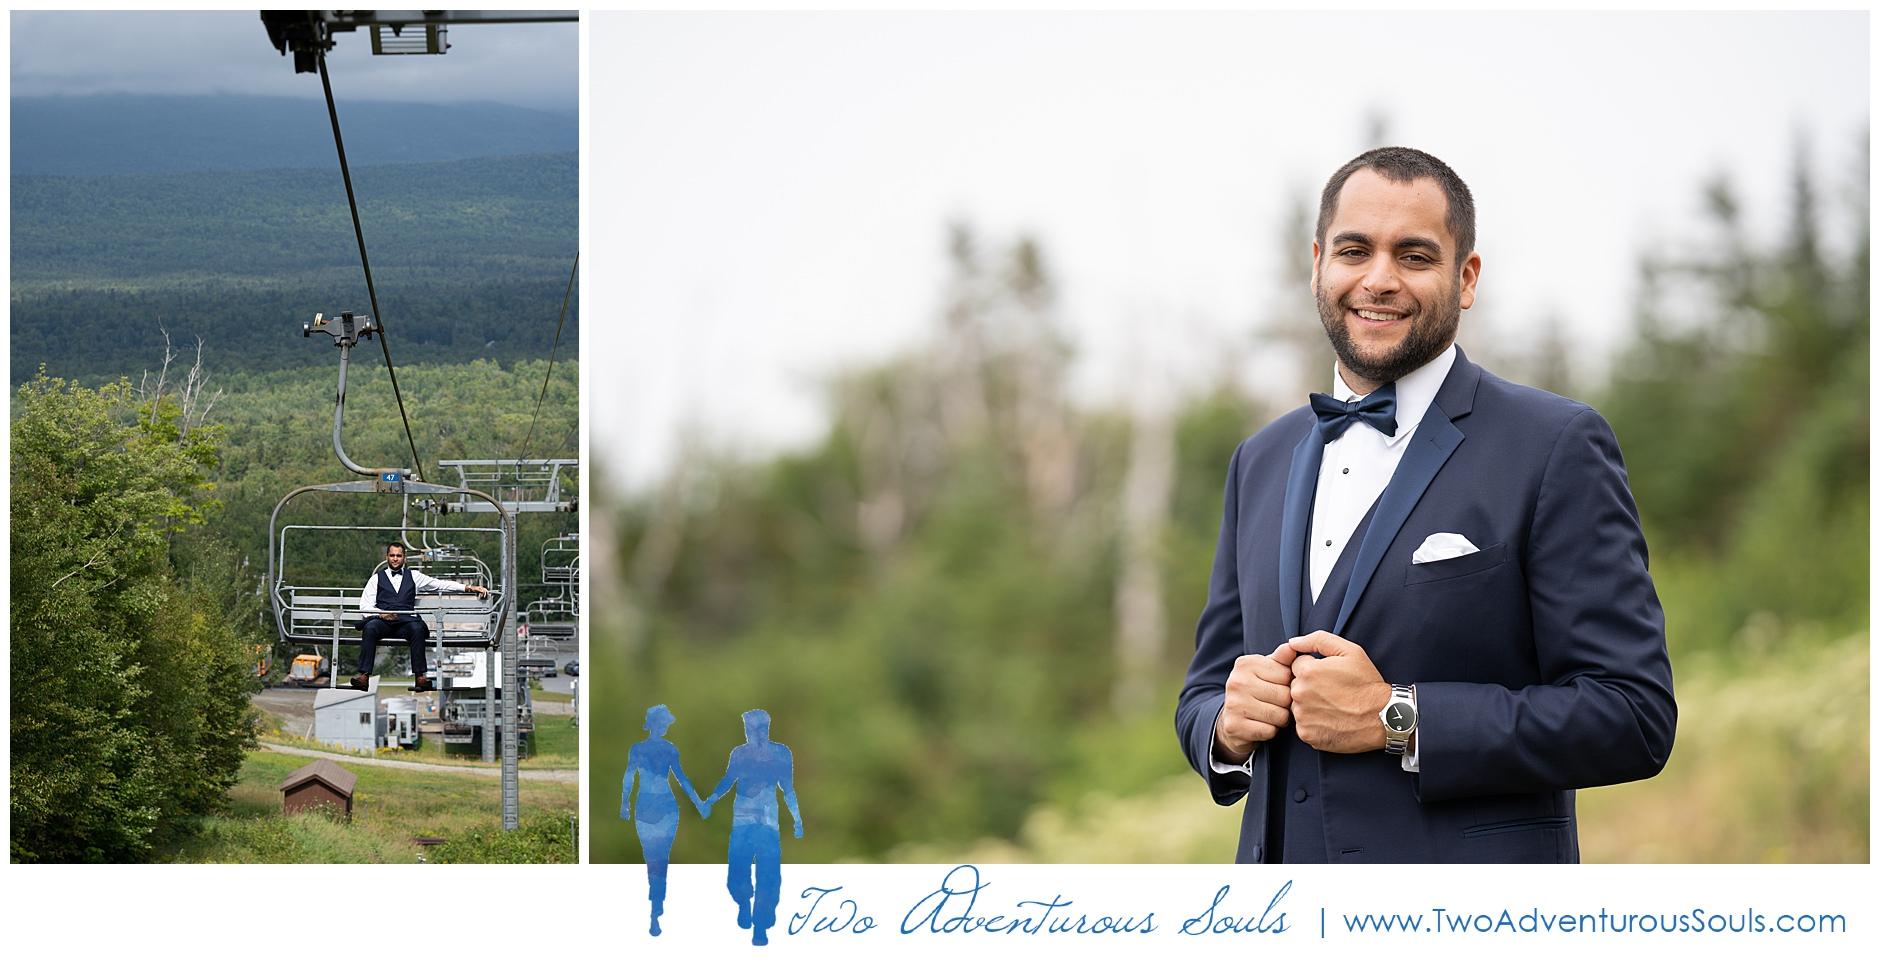 Sugarloaf Outdoor Center Wedding Photographers, Destination Wedding Photographers, Two Adventurous Souls-081719_0015.jpg